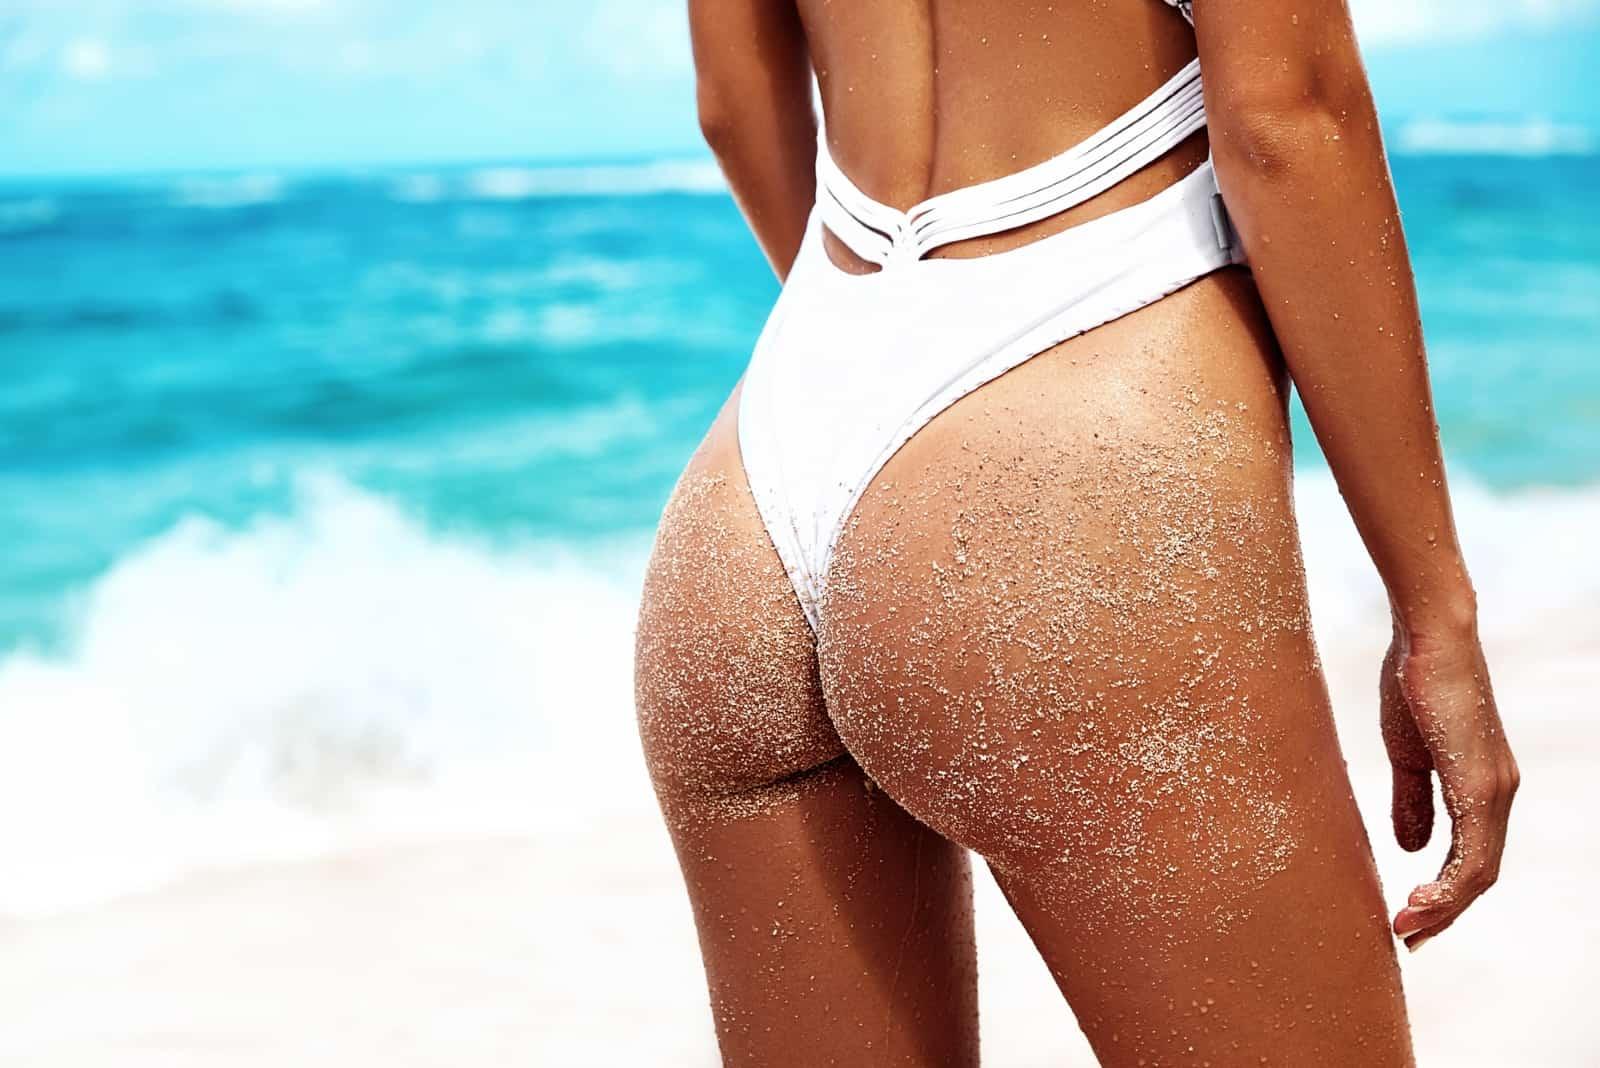 woman in white swimsuit standing near sea